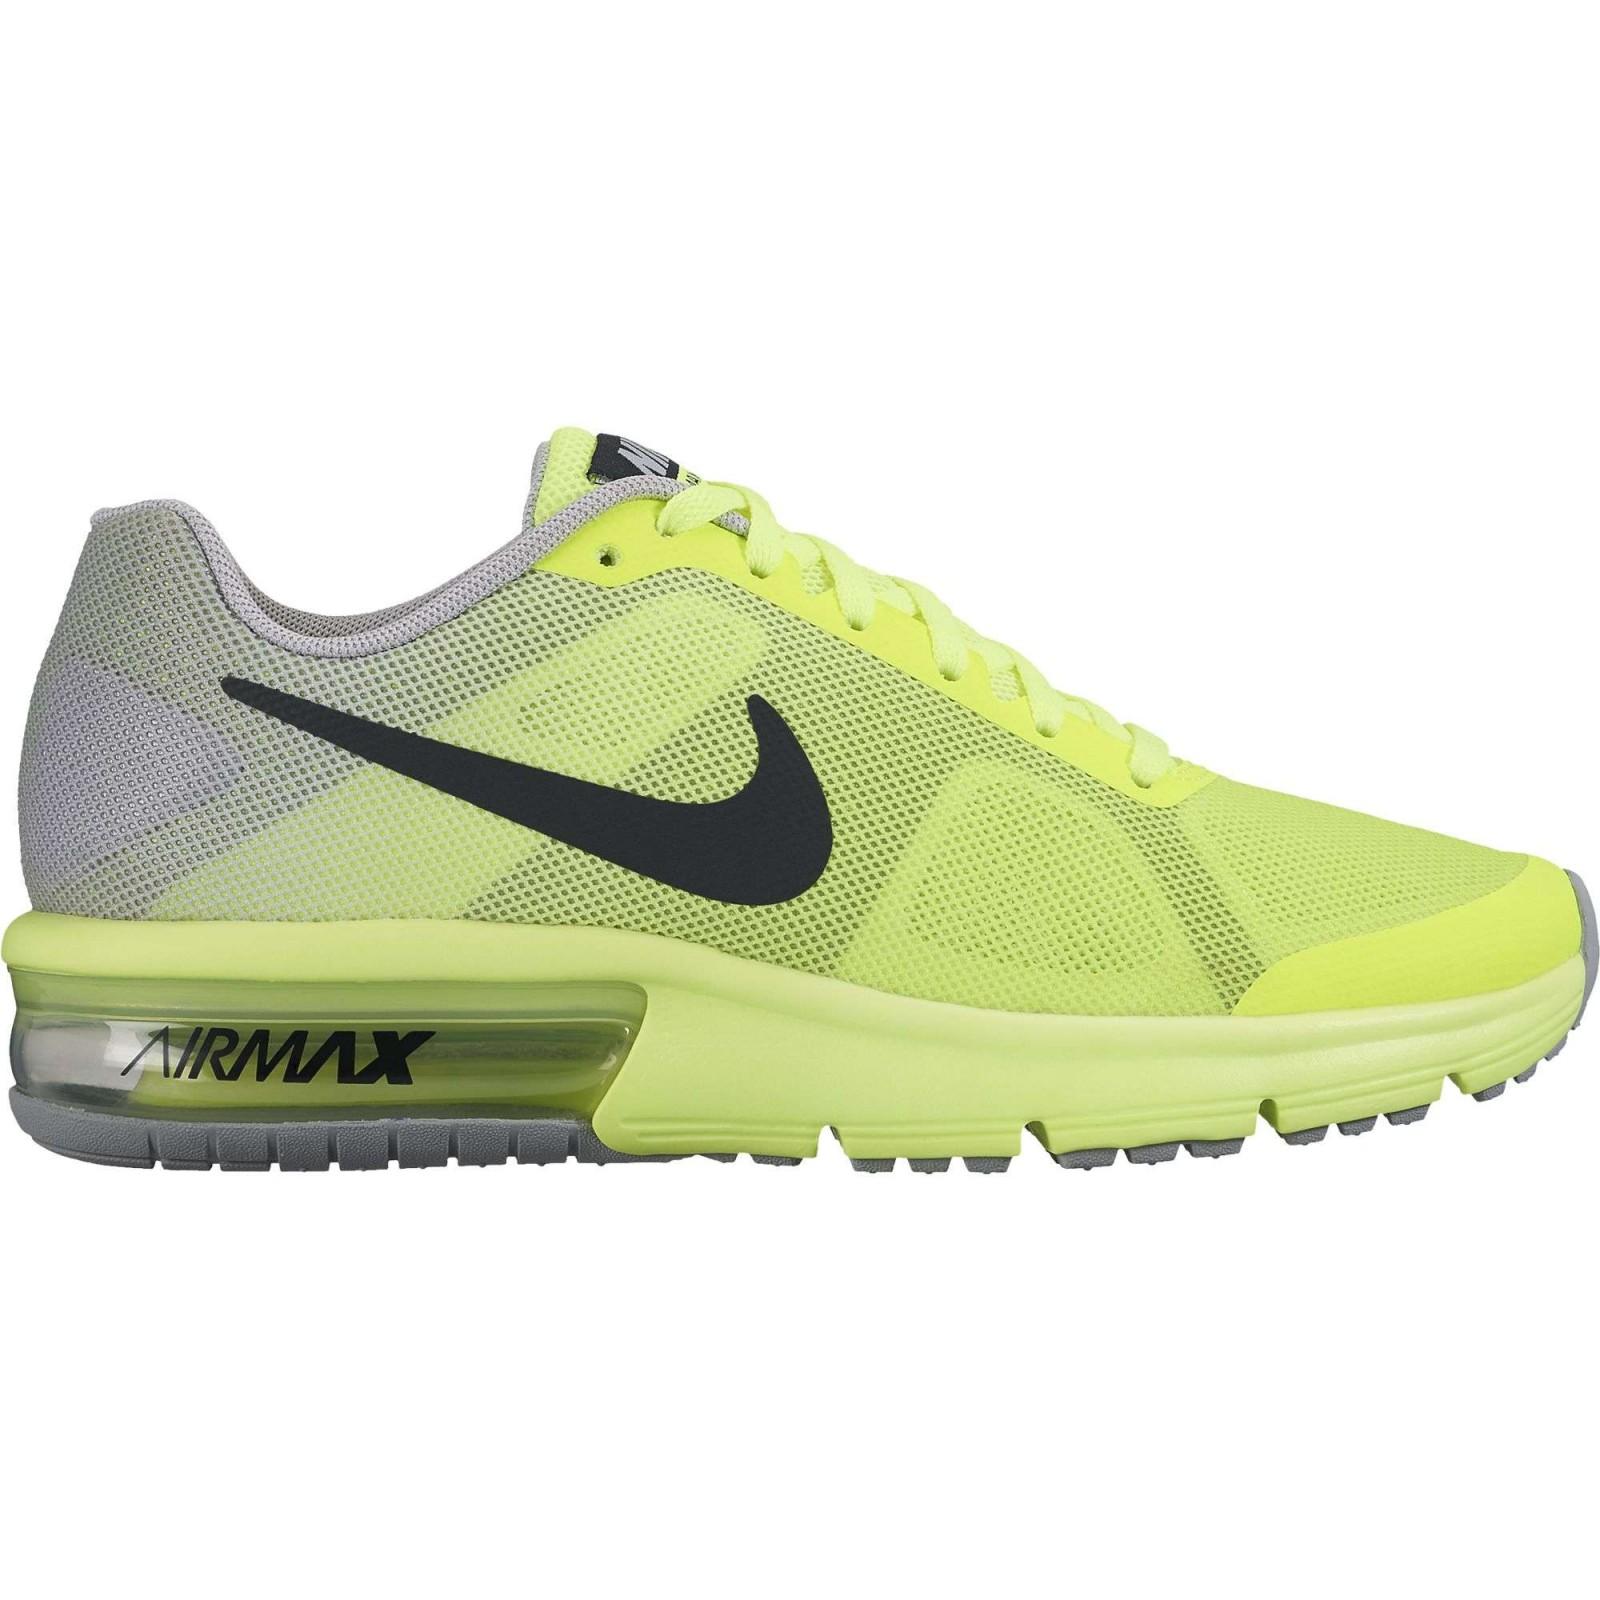 Dětské boty Nike AIR MAX SEQUENT (GS)  927a6d9ad3d